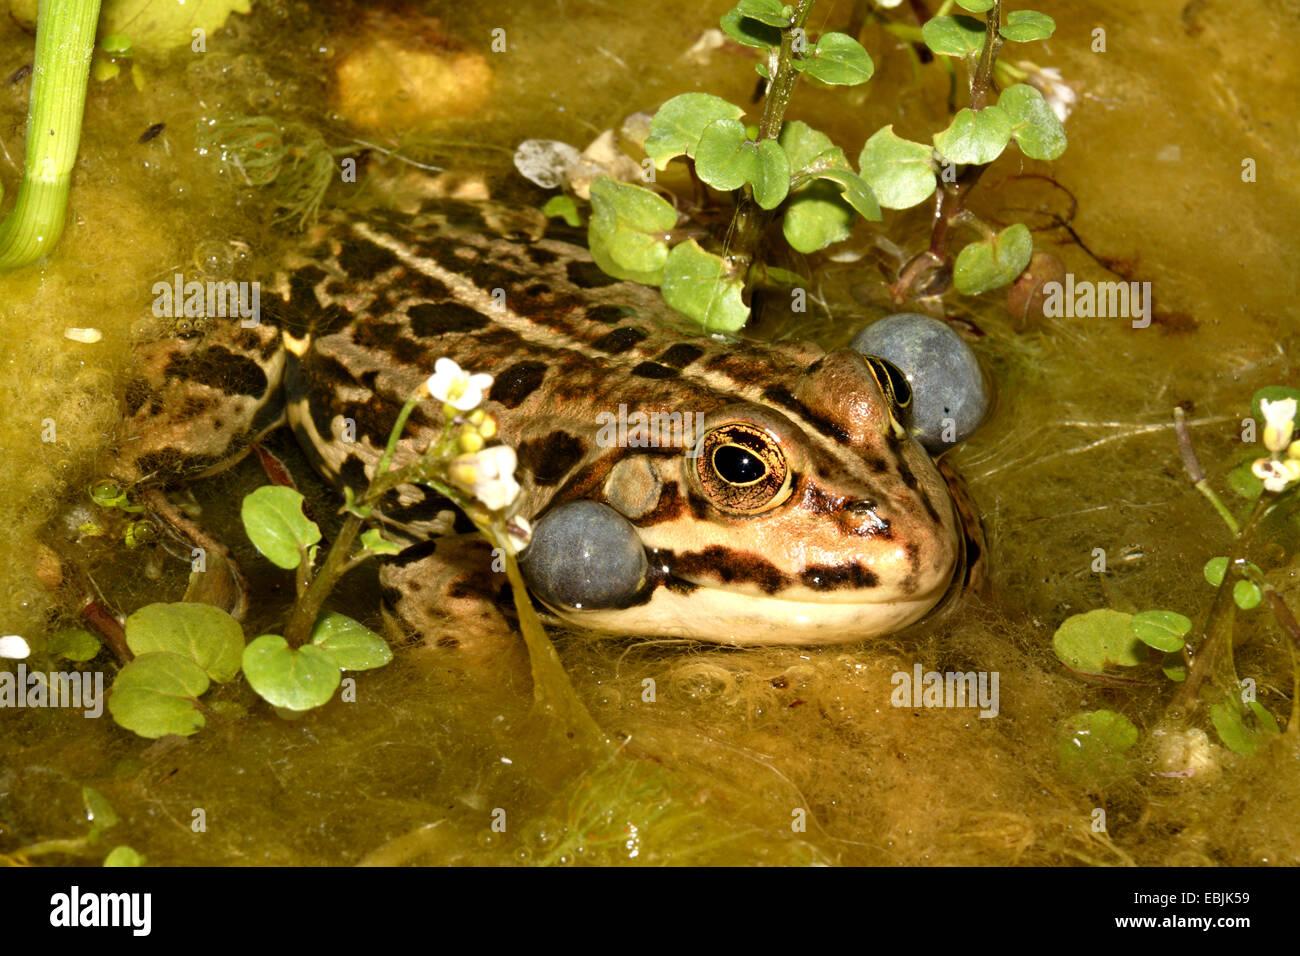 common frog, grass frog (Rana temporaria), croaking, Germany - Stock Image